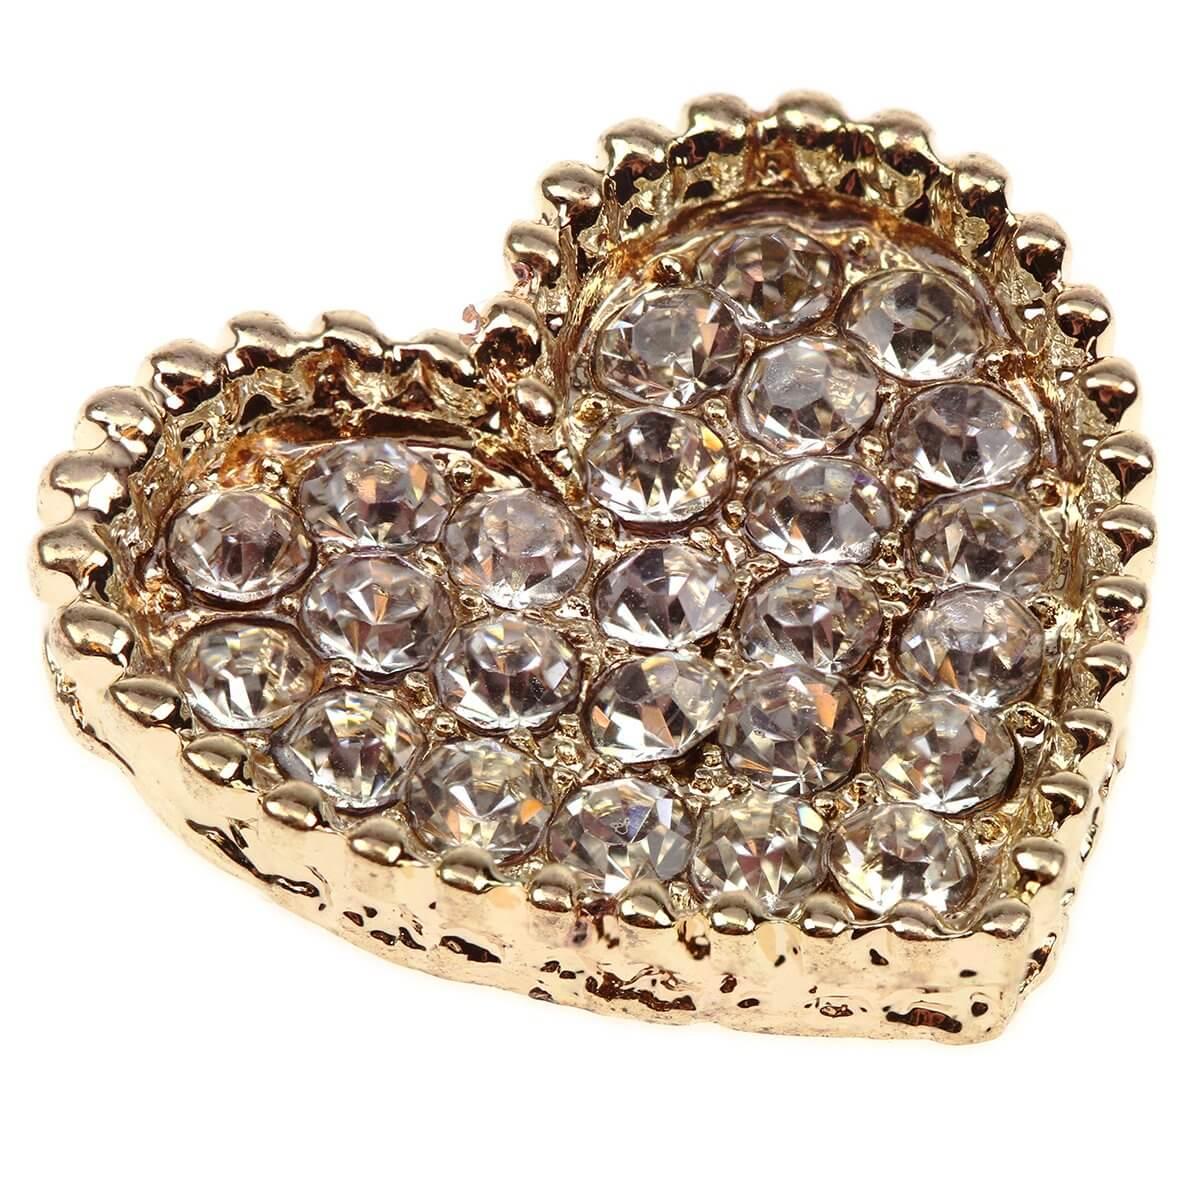 Gold Oribella (Crystal) Embellishment - DIY Wedding Craft